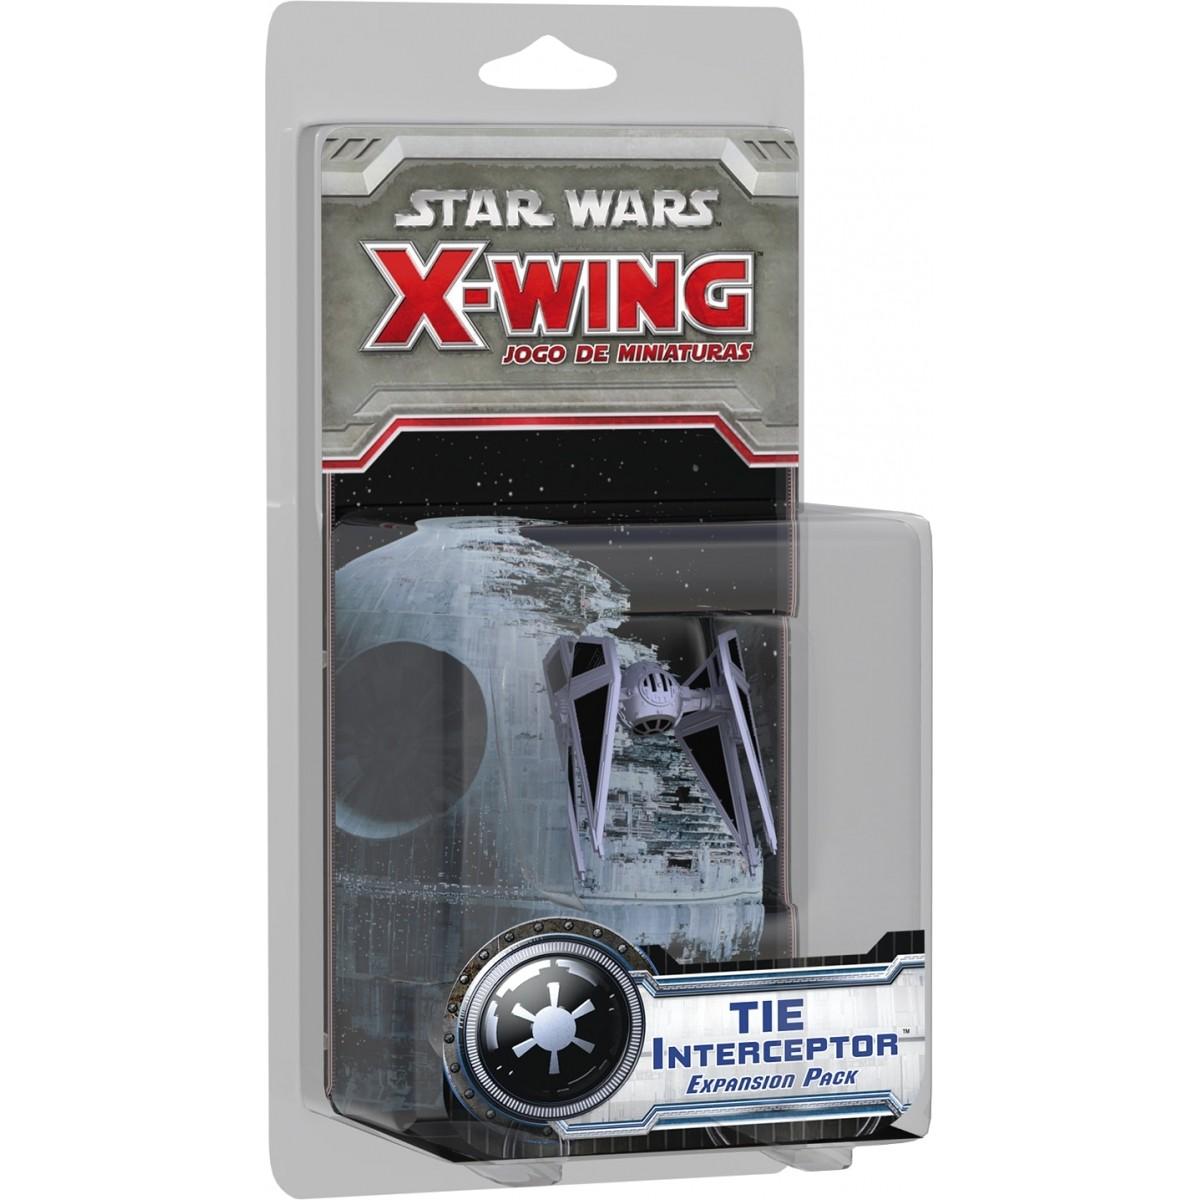 Star Wars X Wing TIE Interceptor Galapagos SWX009  - Place Games